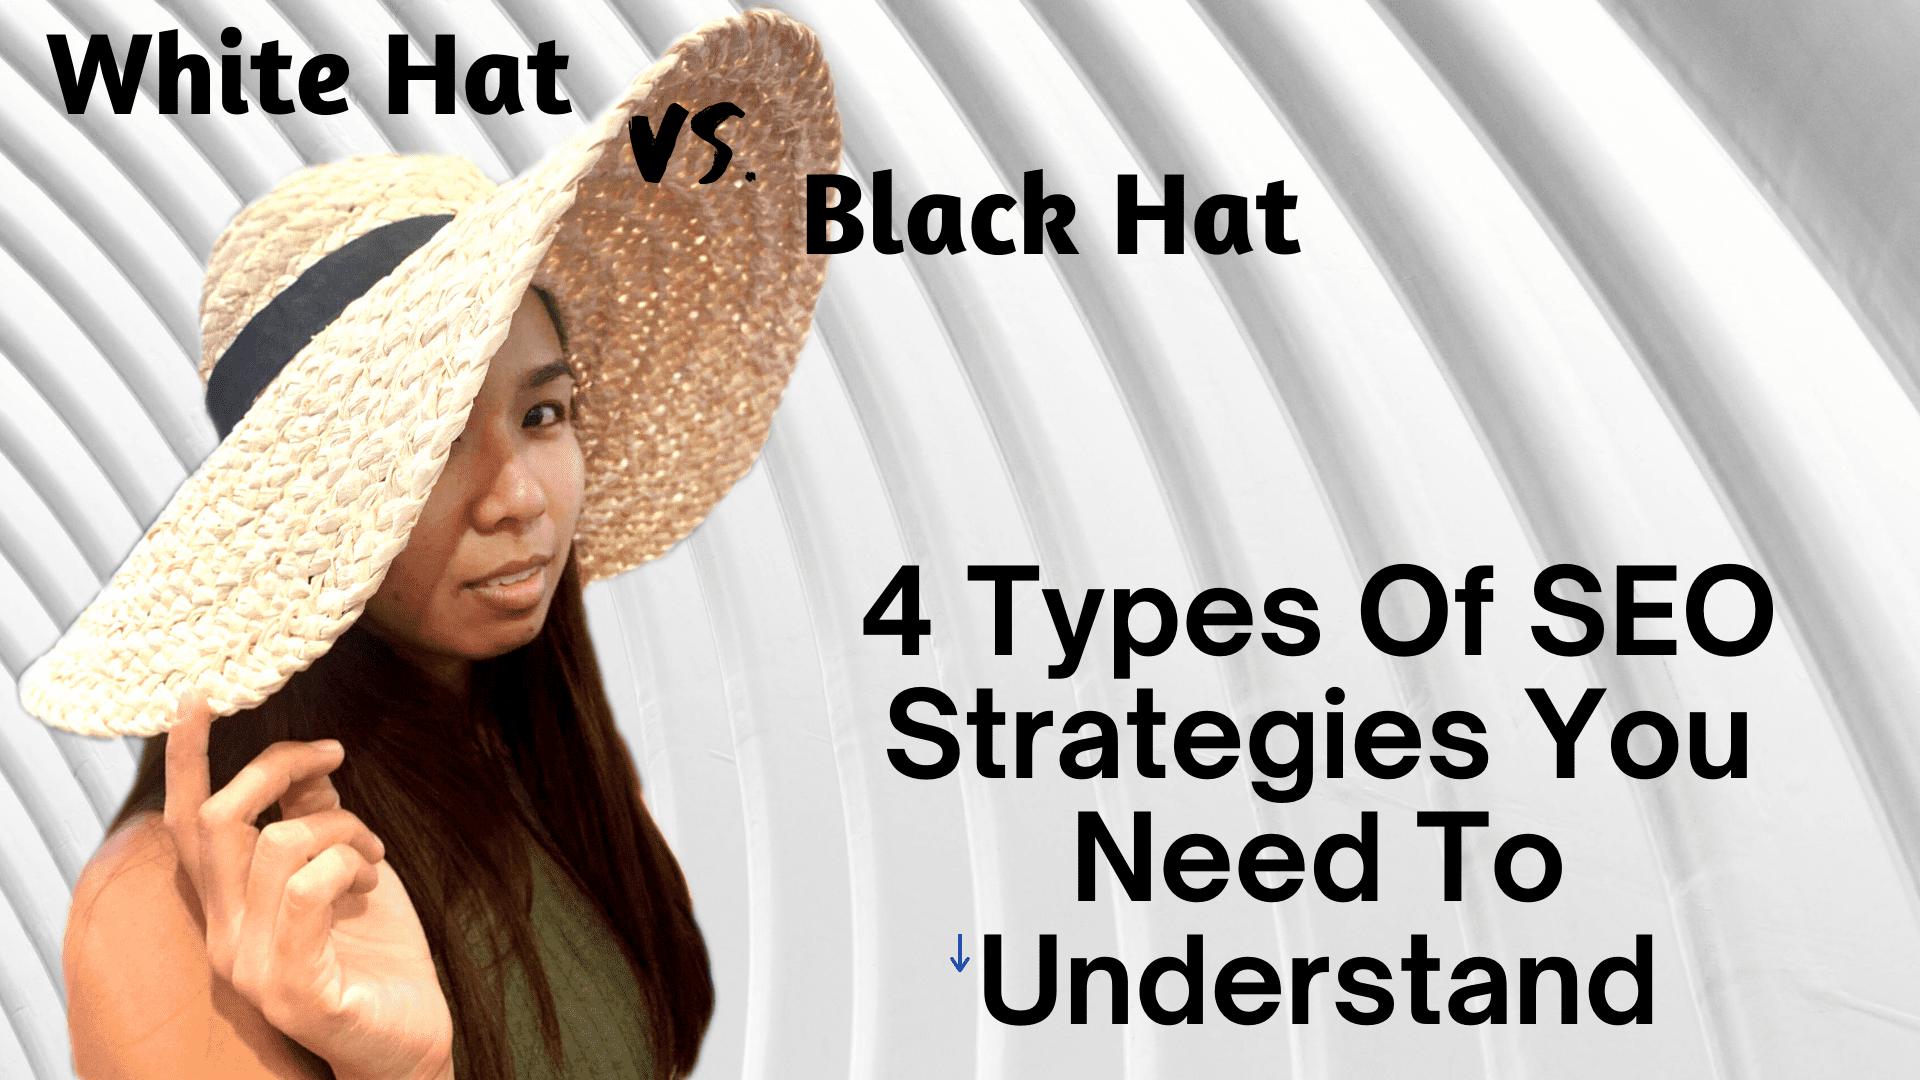 4 Types Of SEO Strategies - White Hat vs. Black Hat